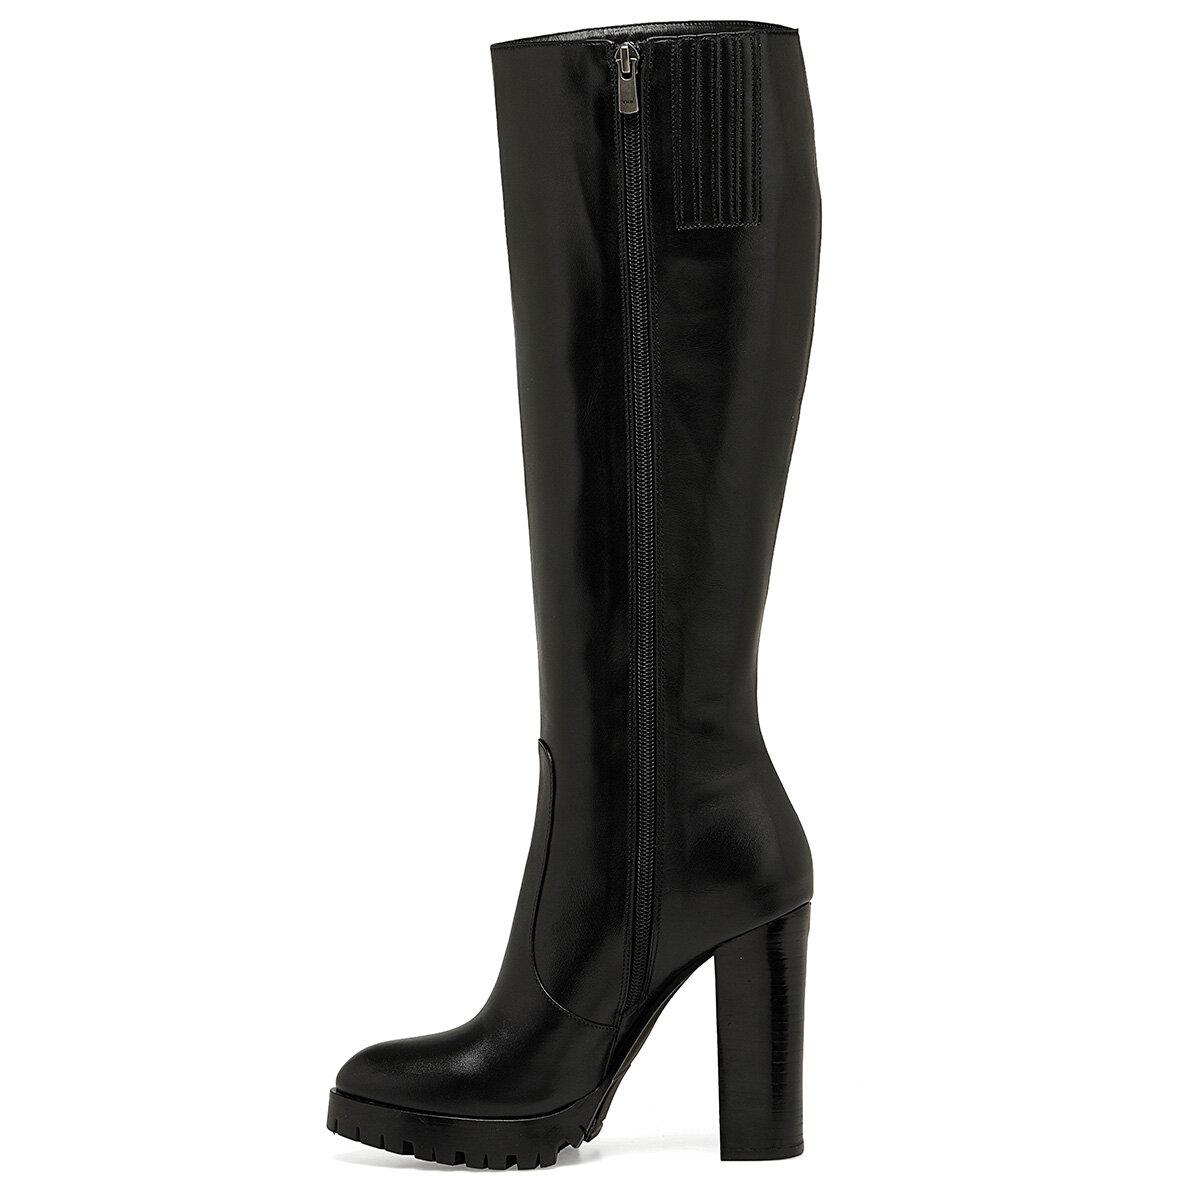 NINA Siyah Kadın Topuklu Çizme